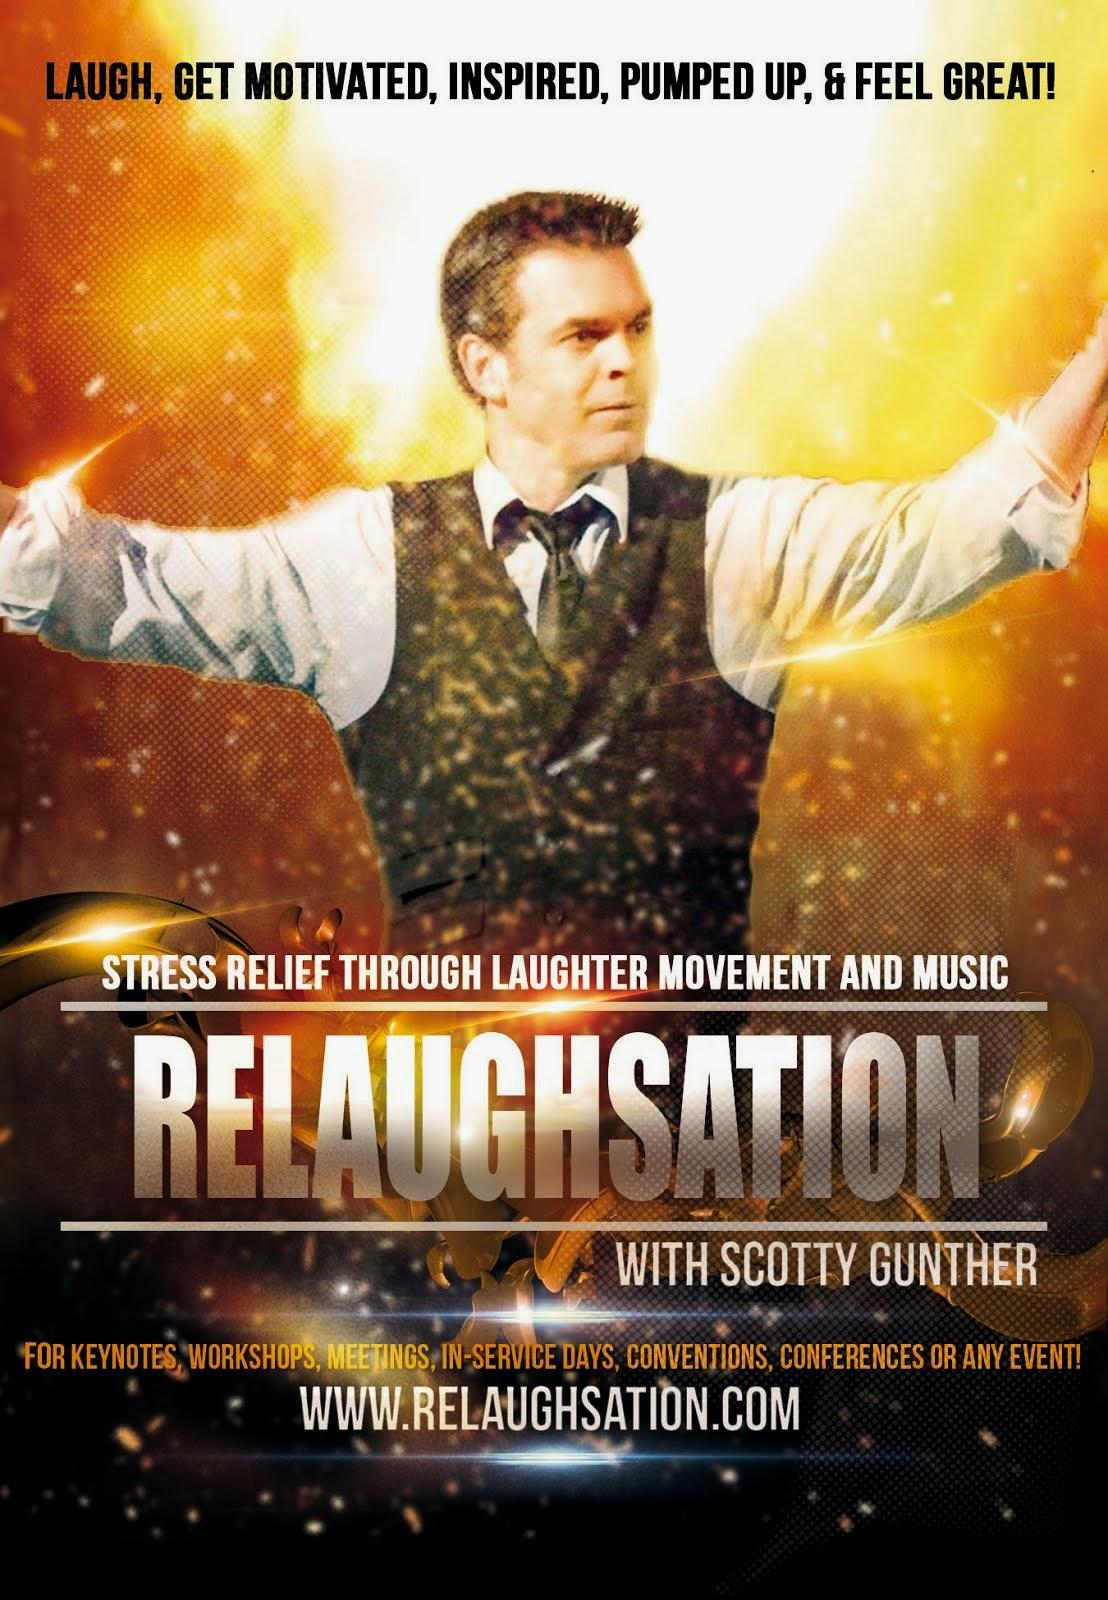 Relaughsation